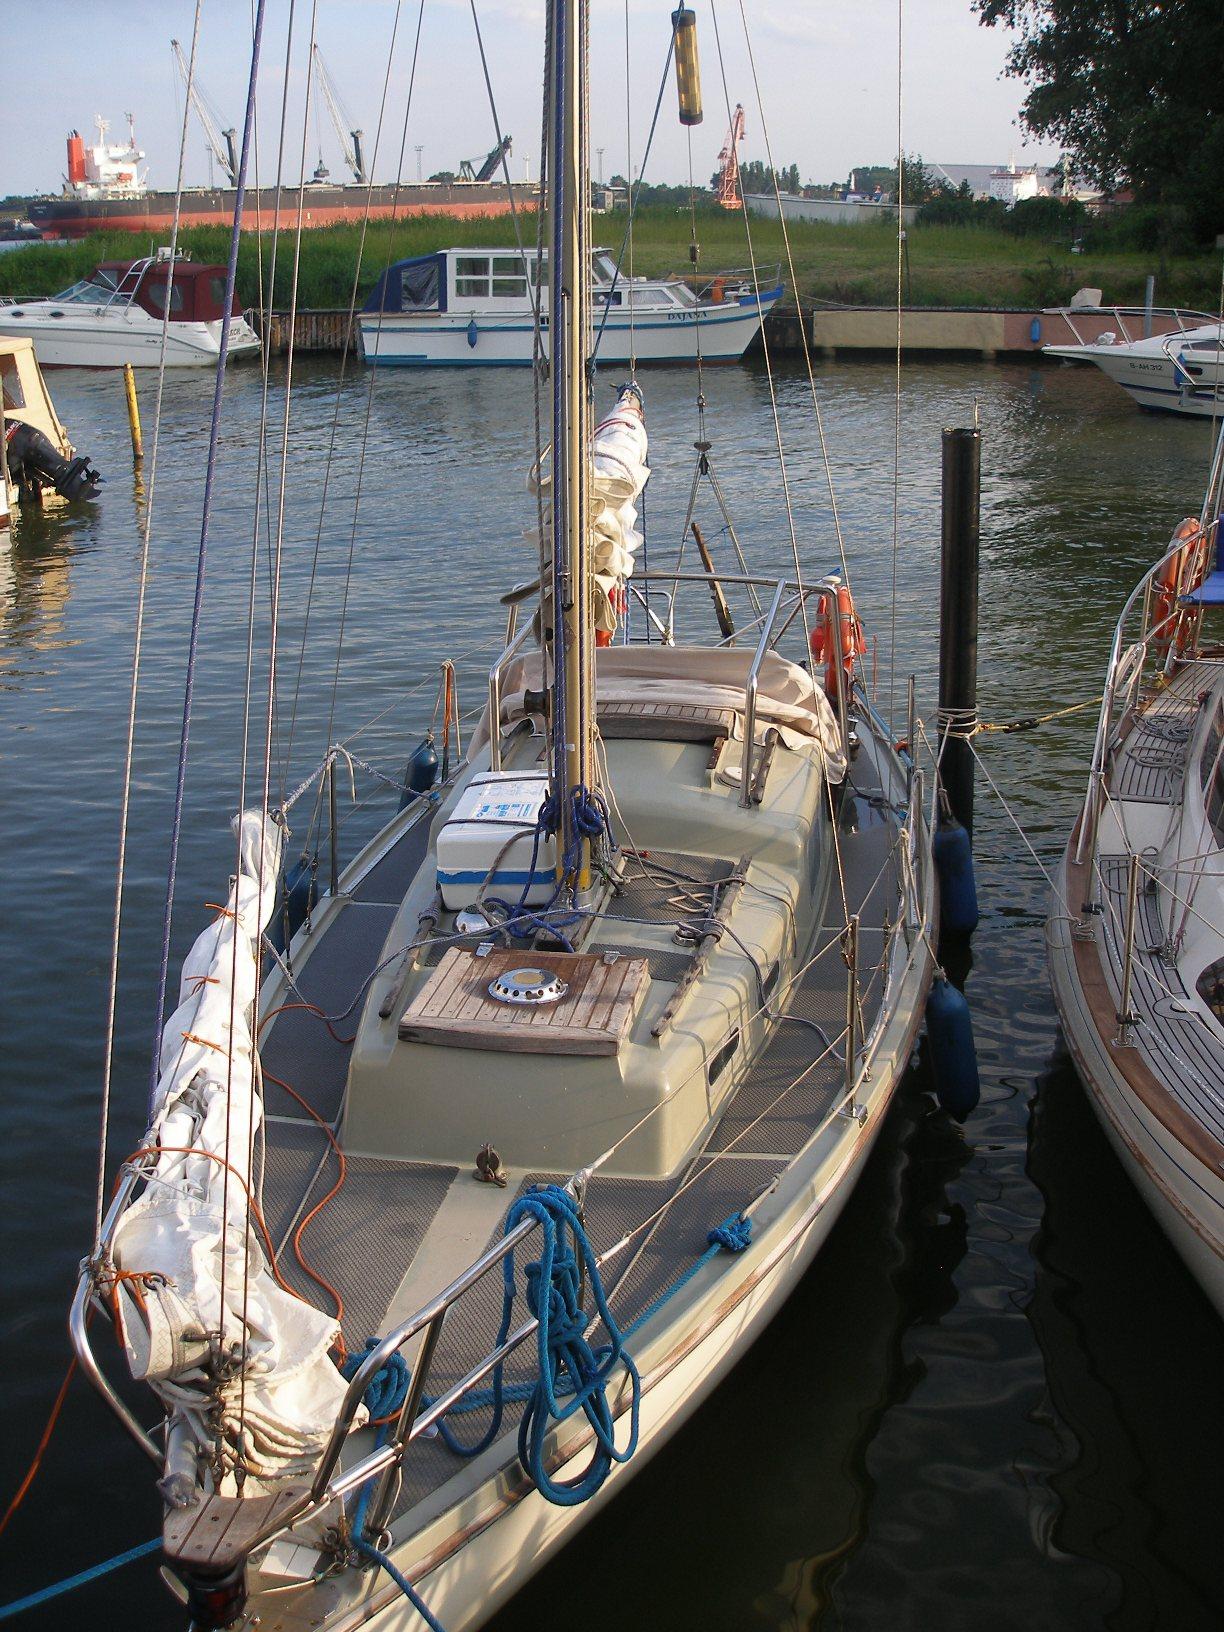 rejsy morskie morze północne, rejsy morskie bałtyk, S/Y Easy